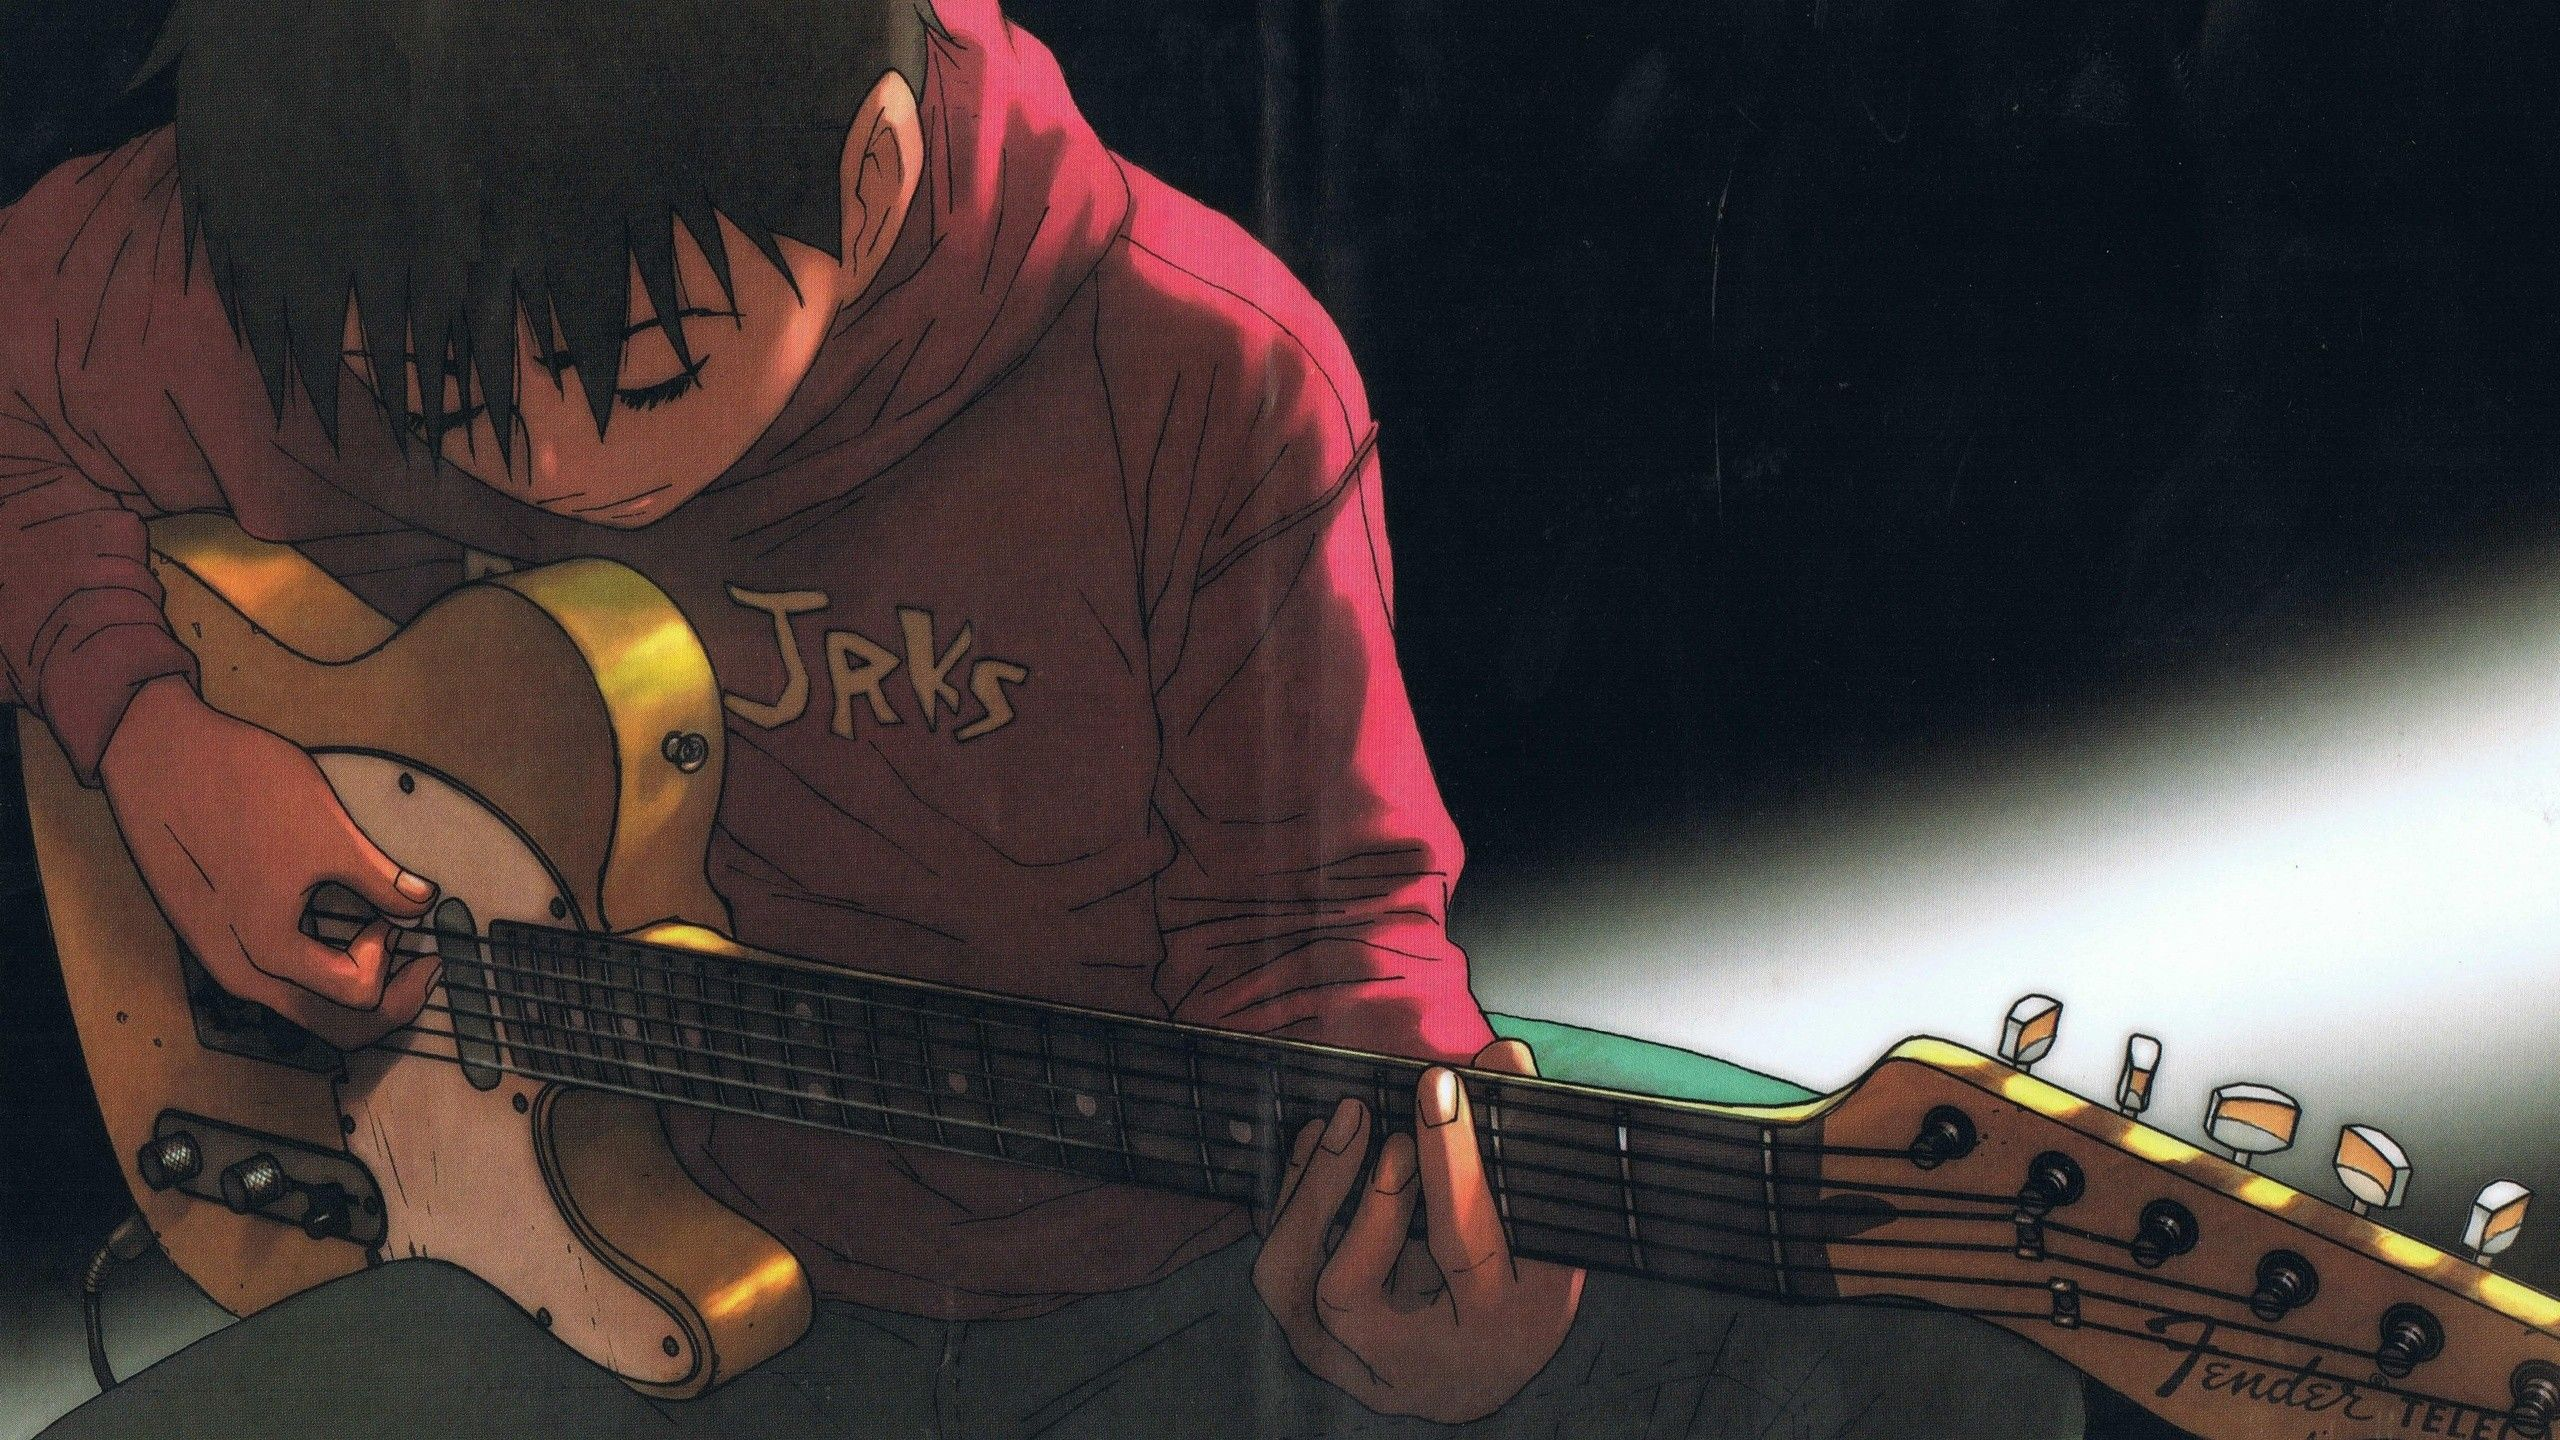 Pin By Alejandro Mamani Rojas On Amime Boy Art Anime Boy Sketch Anime Drawings Boy Dream Anime